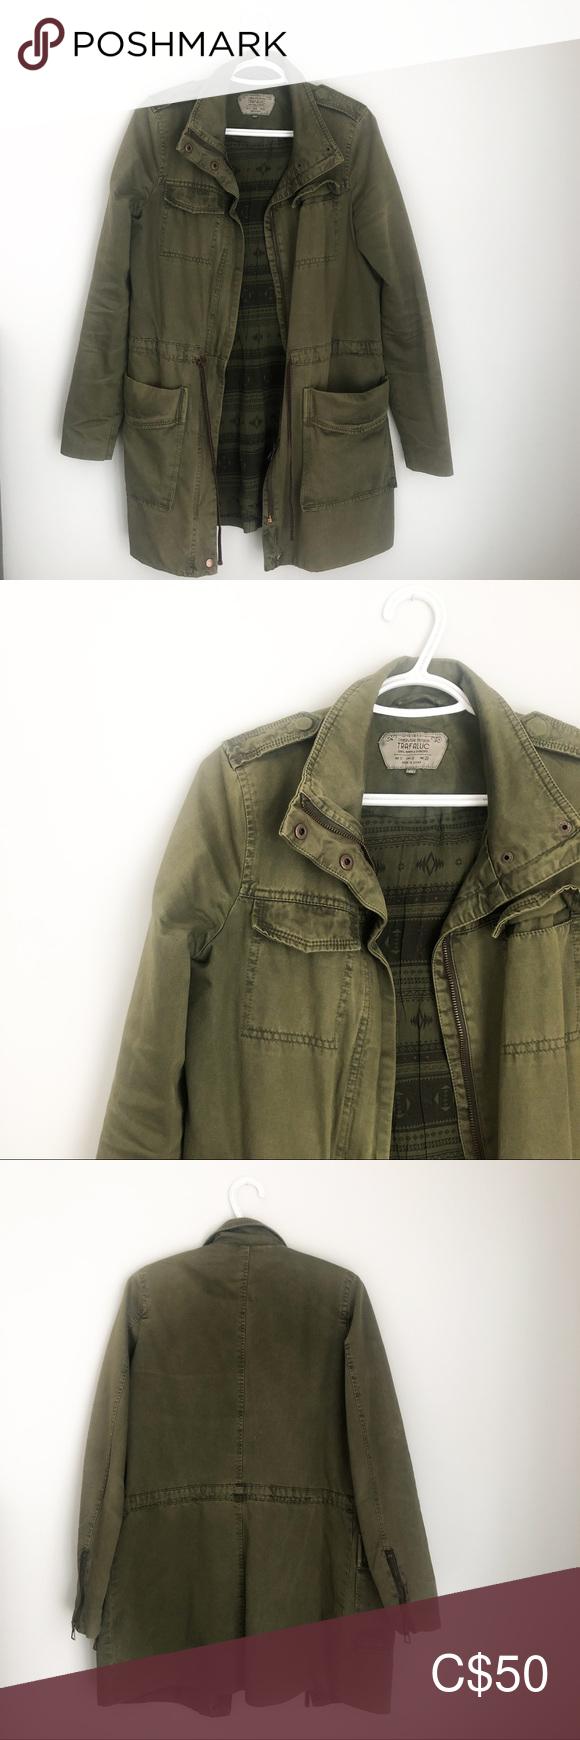 Zara Utility Jacket Jackets Outerwear Jackets Utility Jacket [ 1740 x 580 Pixel ]